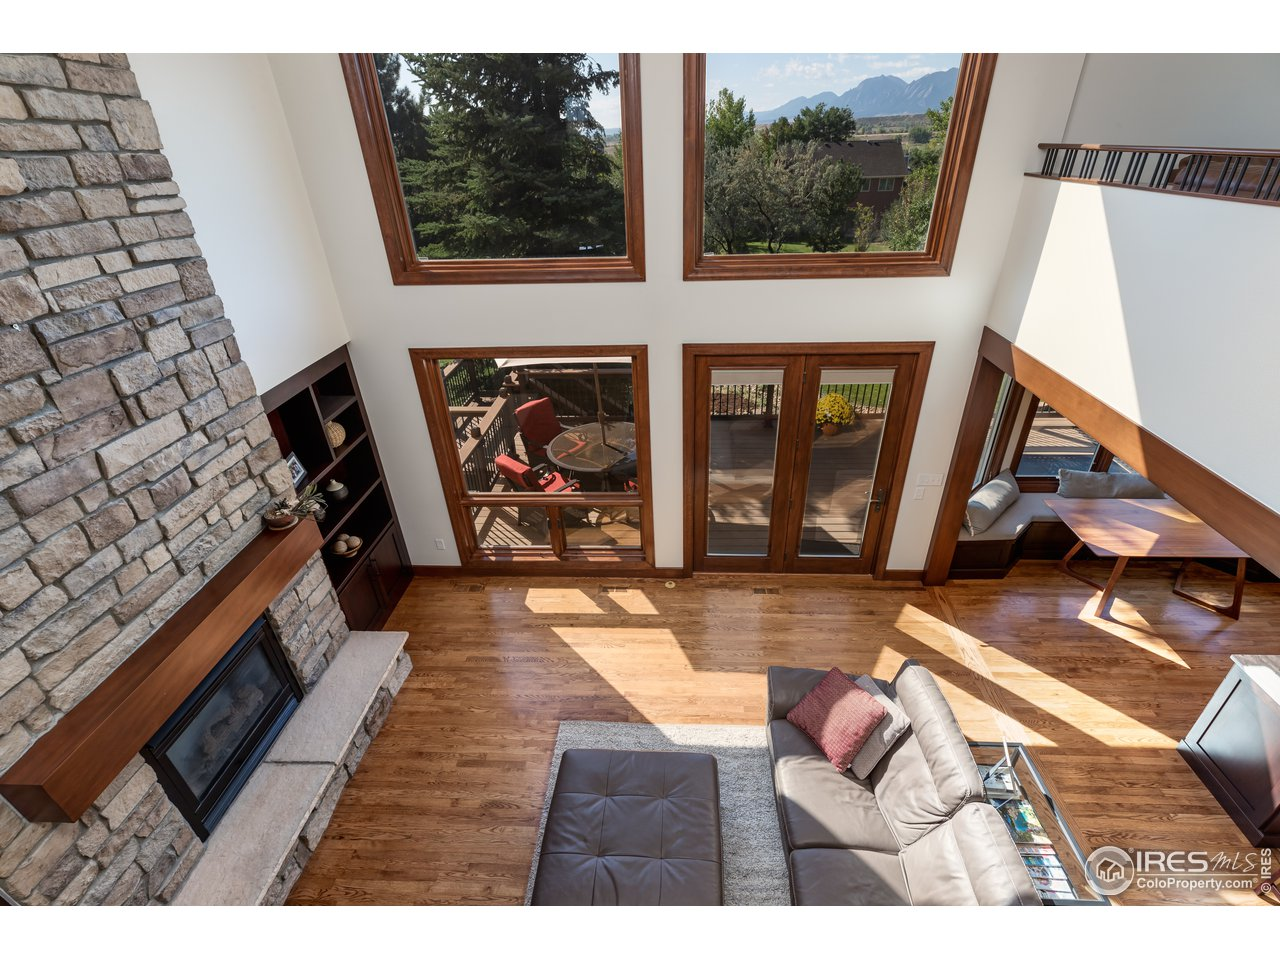 Overlook of Family Room